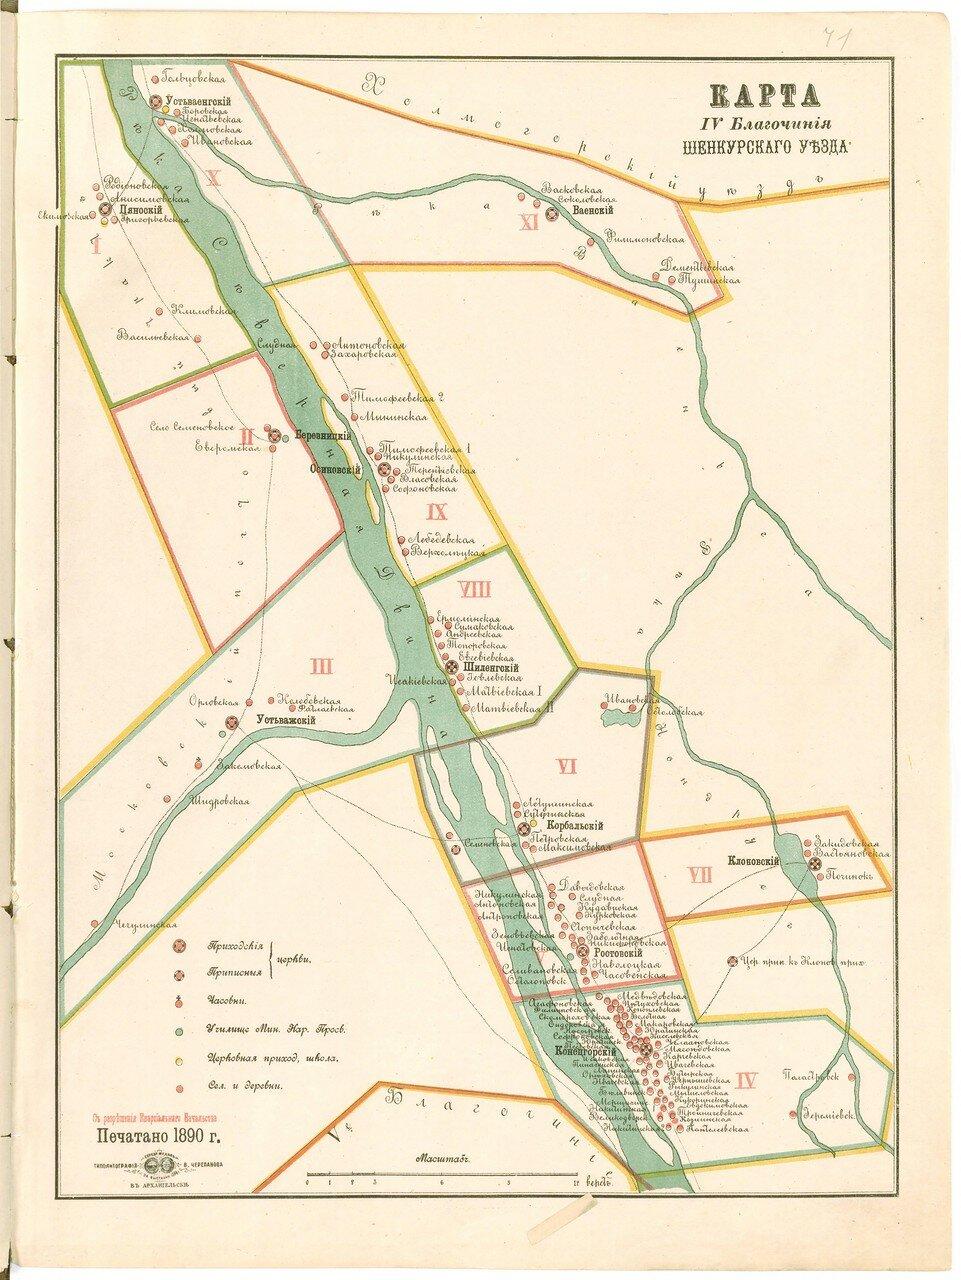 Шенкурсий уезд, IV благочиние